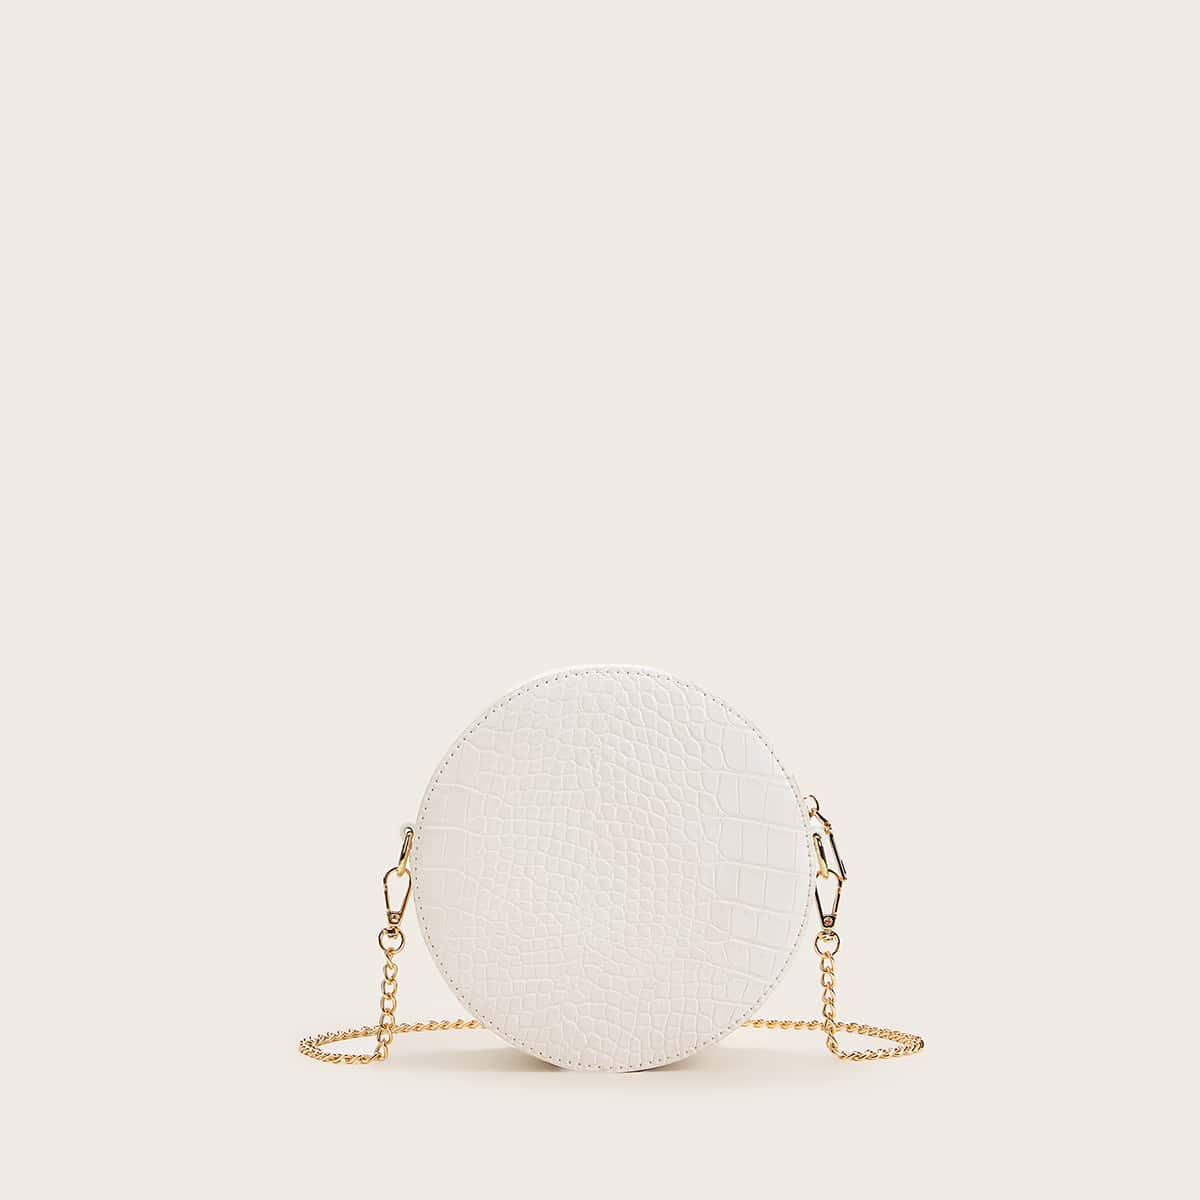 Рельефная круглая сумка на цепочке